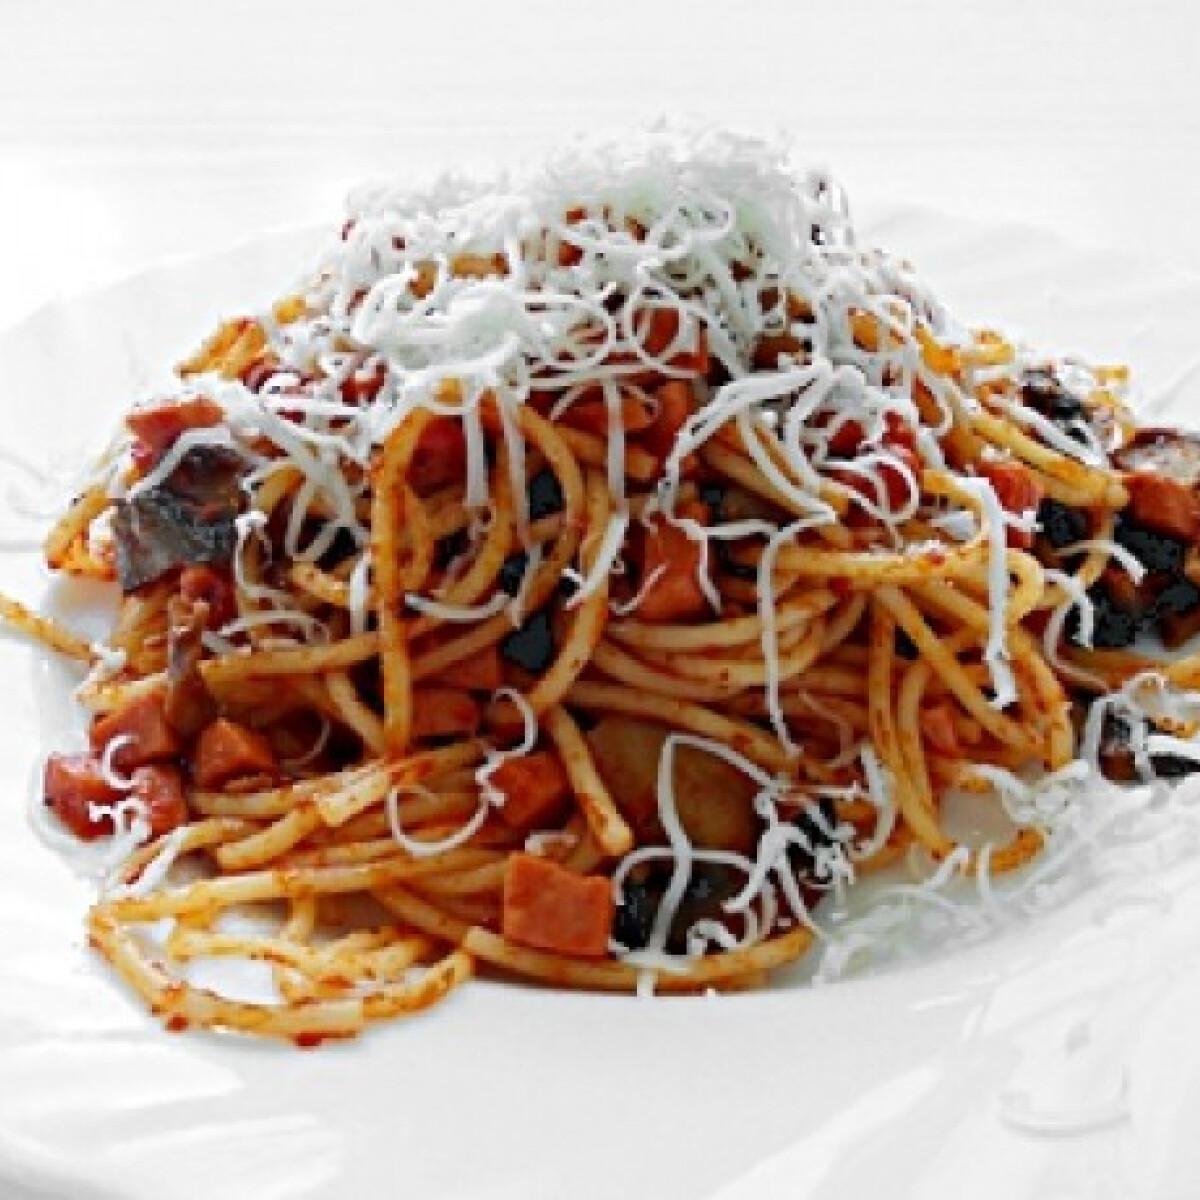 Milánói spagetti Jahmaica konyhájából